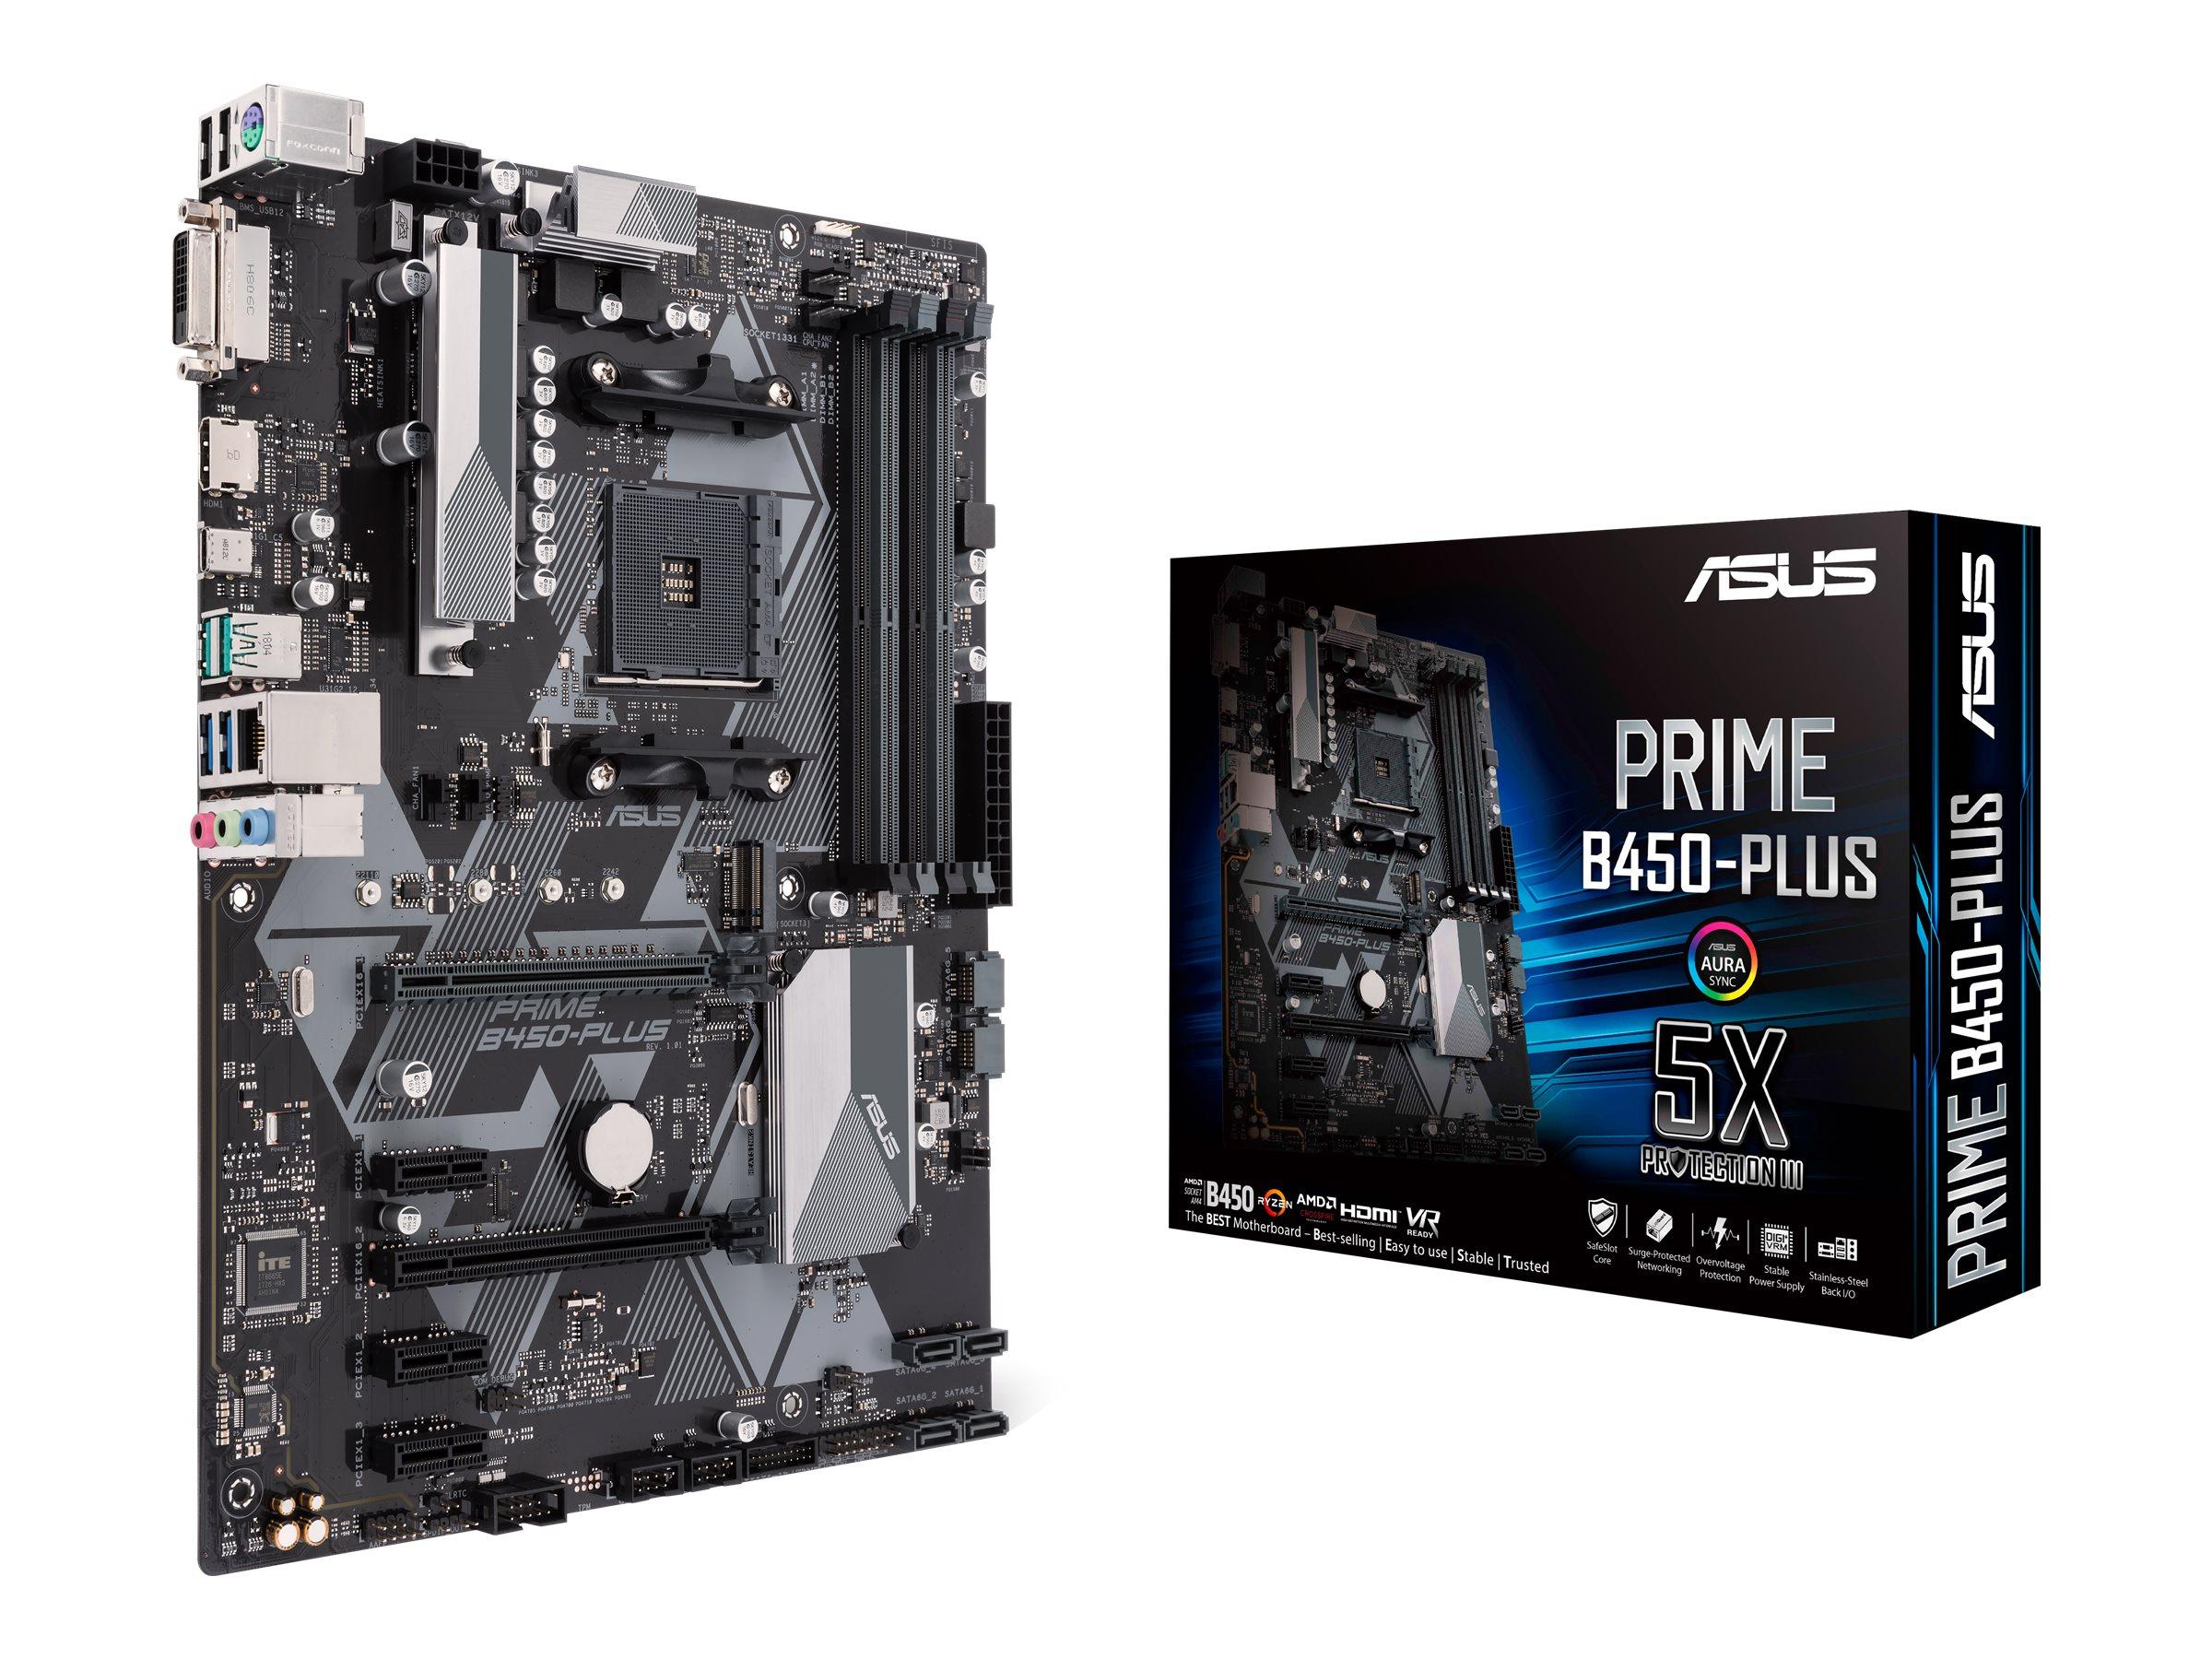 ASUS PRIME B450-PLUS - Motherboard - ATX - Socket AM4 - AMD B450 - USB 3.1 Gen 1, USB 3.1 Gen 2, USB-C Gen1